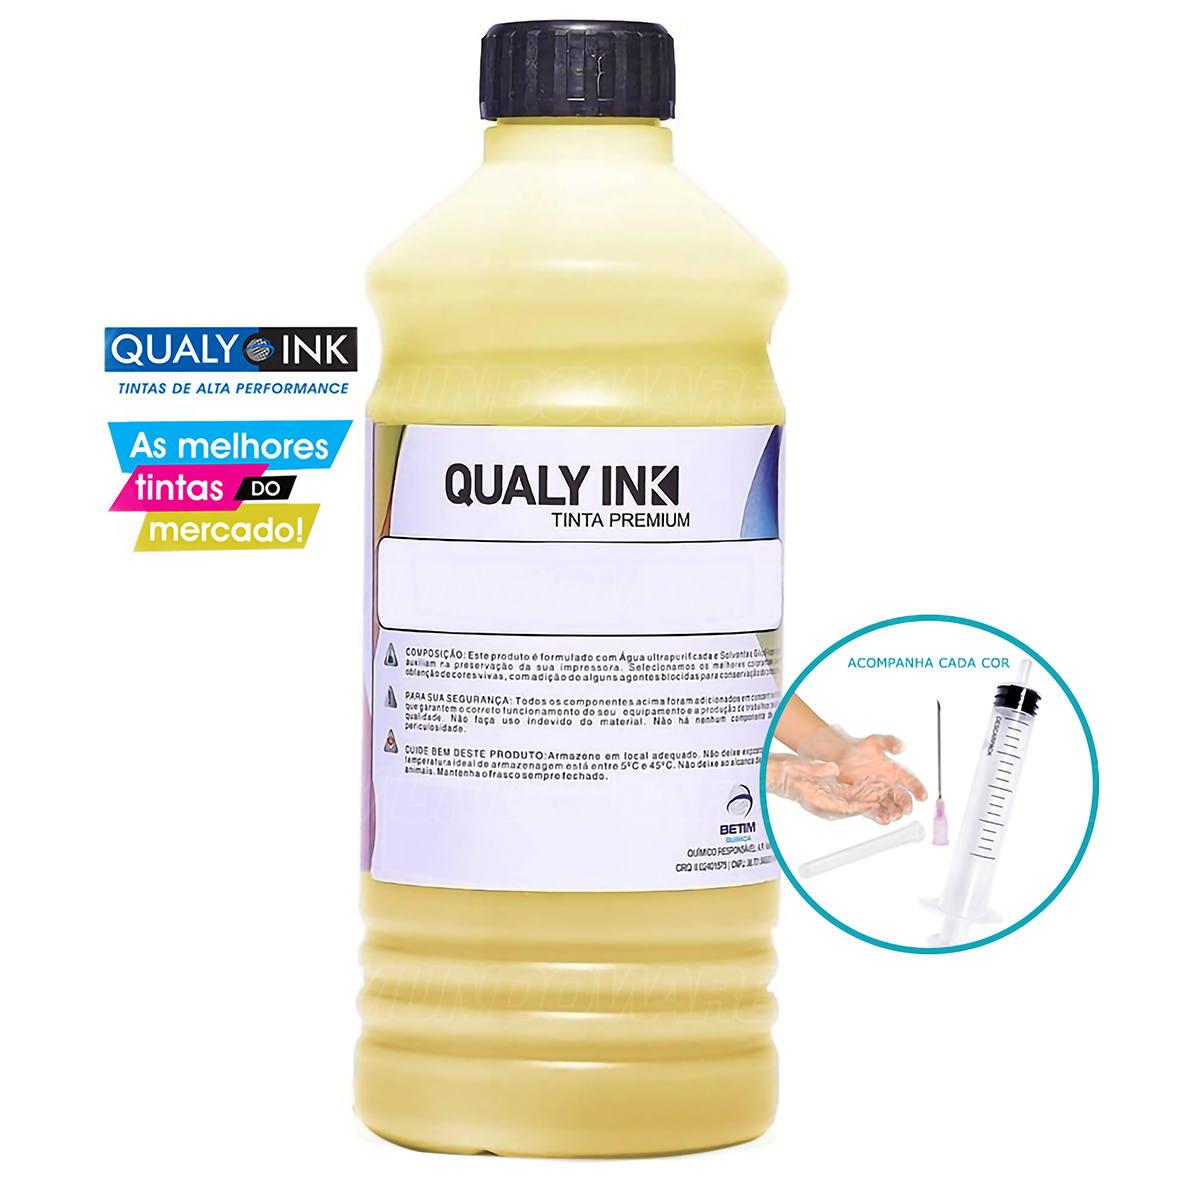 Tinta Corante Qualy-Ink Universal para Cartucho Bulk Ink e Tanque de Tinta Amarelo Refil 1L